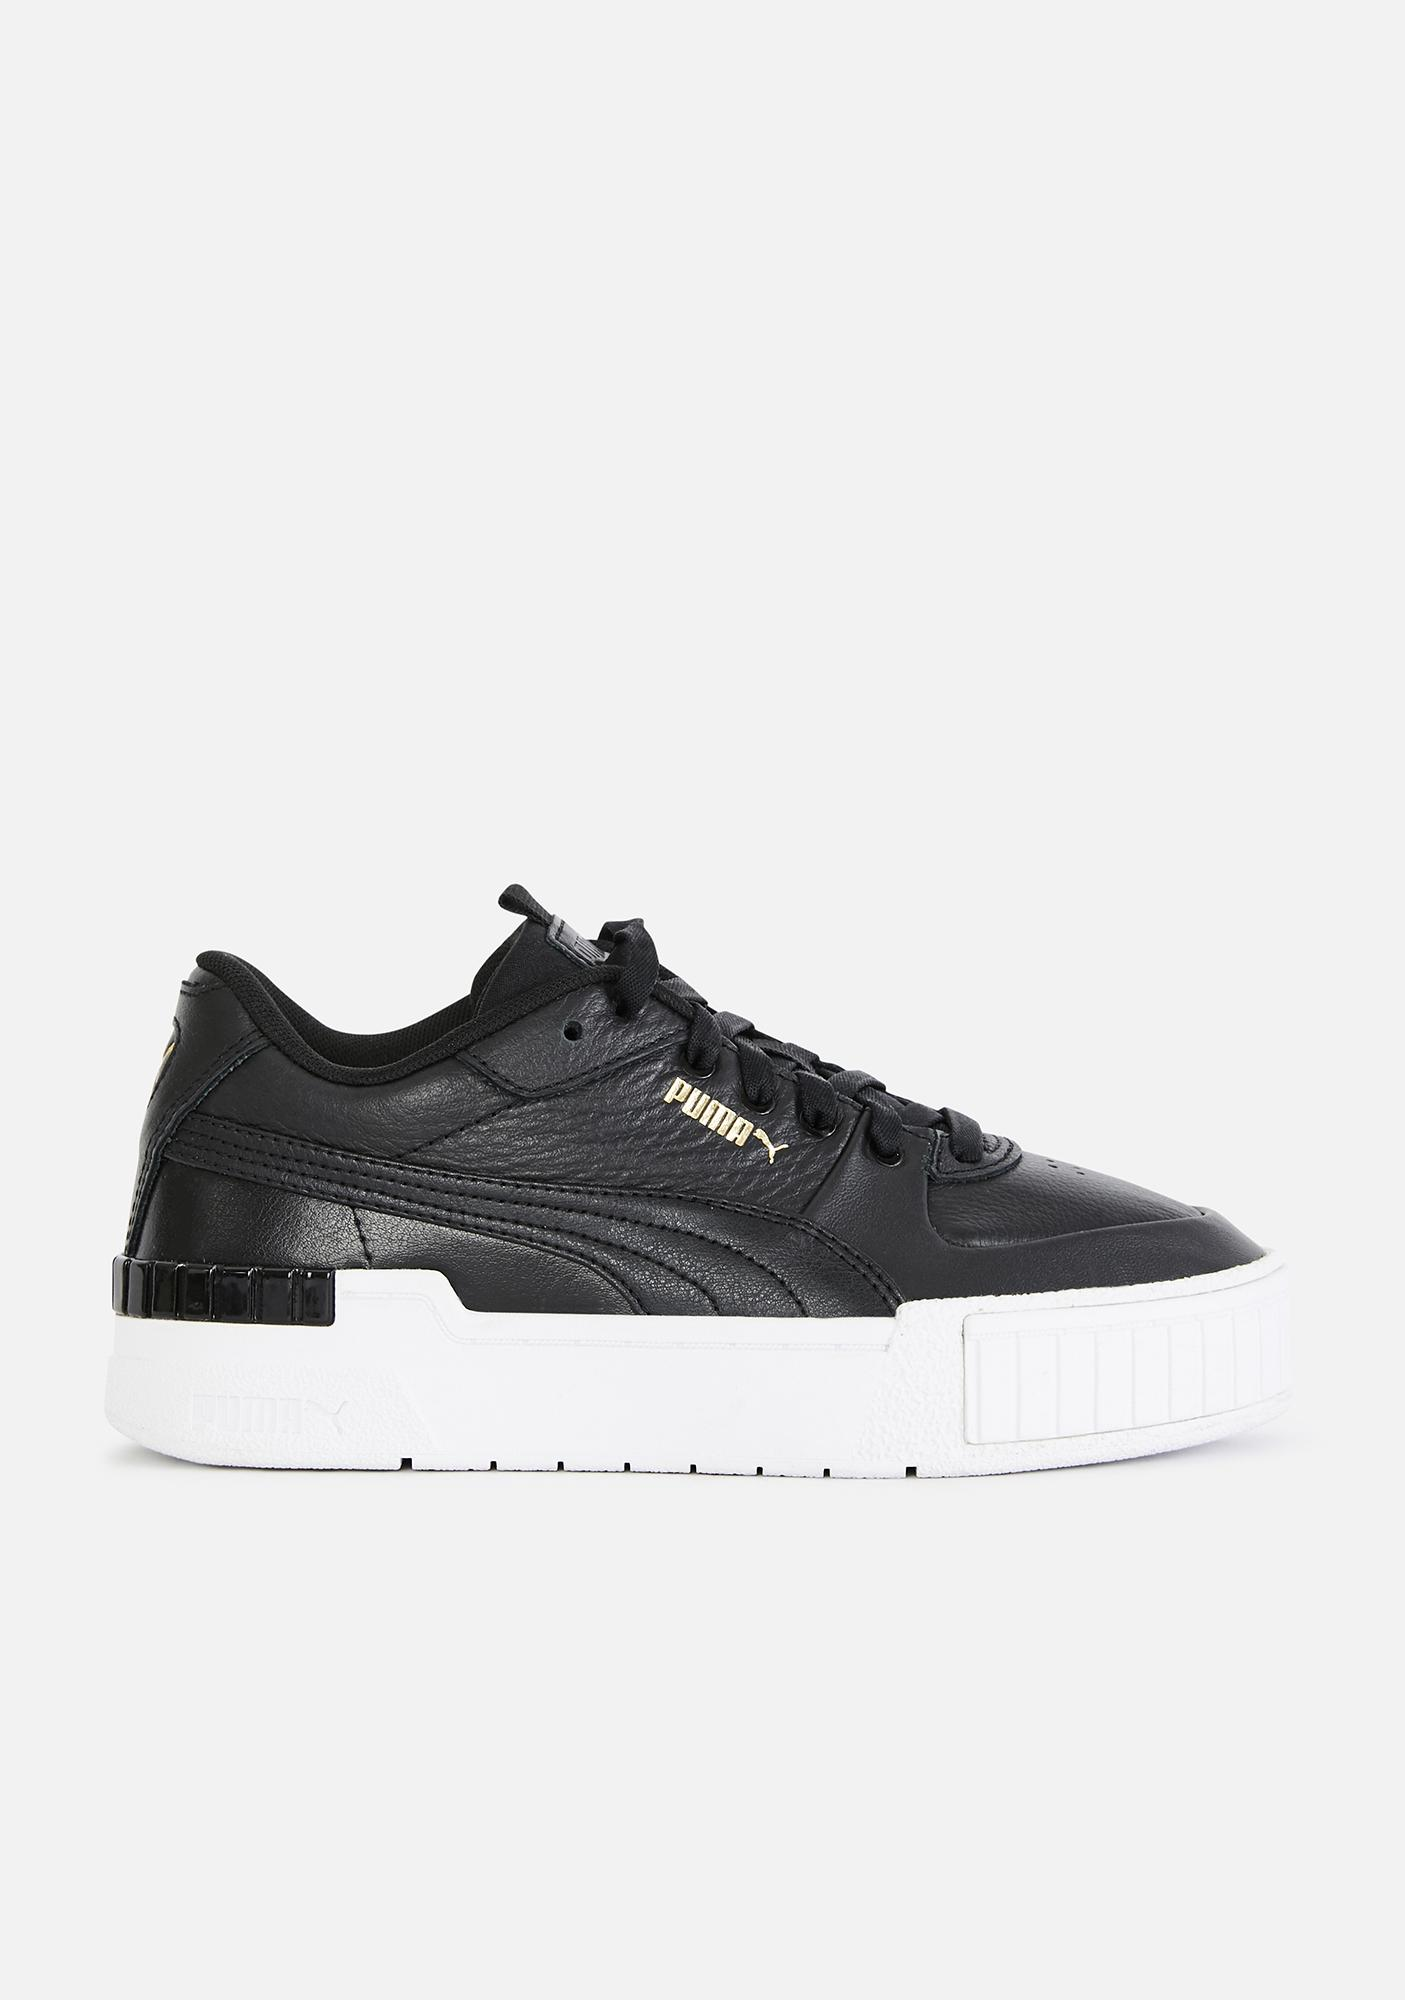 PUMA Black Cali Sport Sneakers